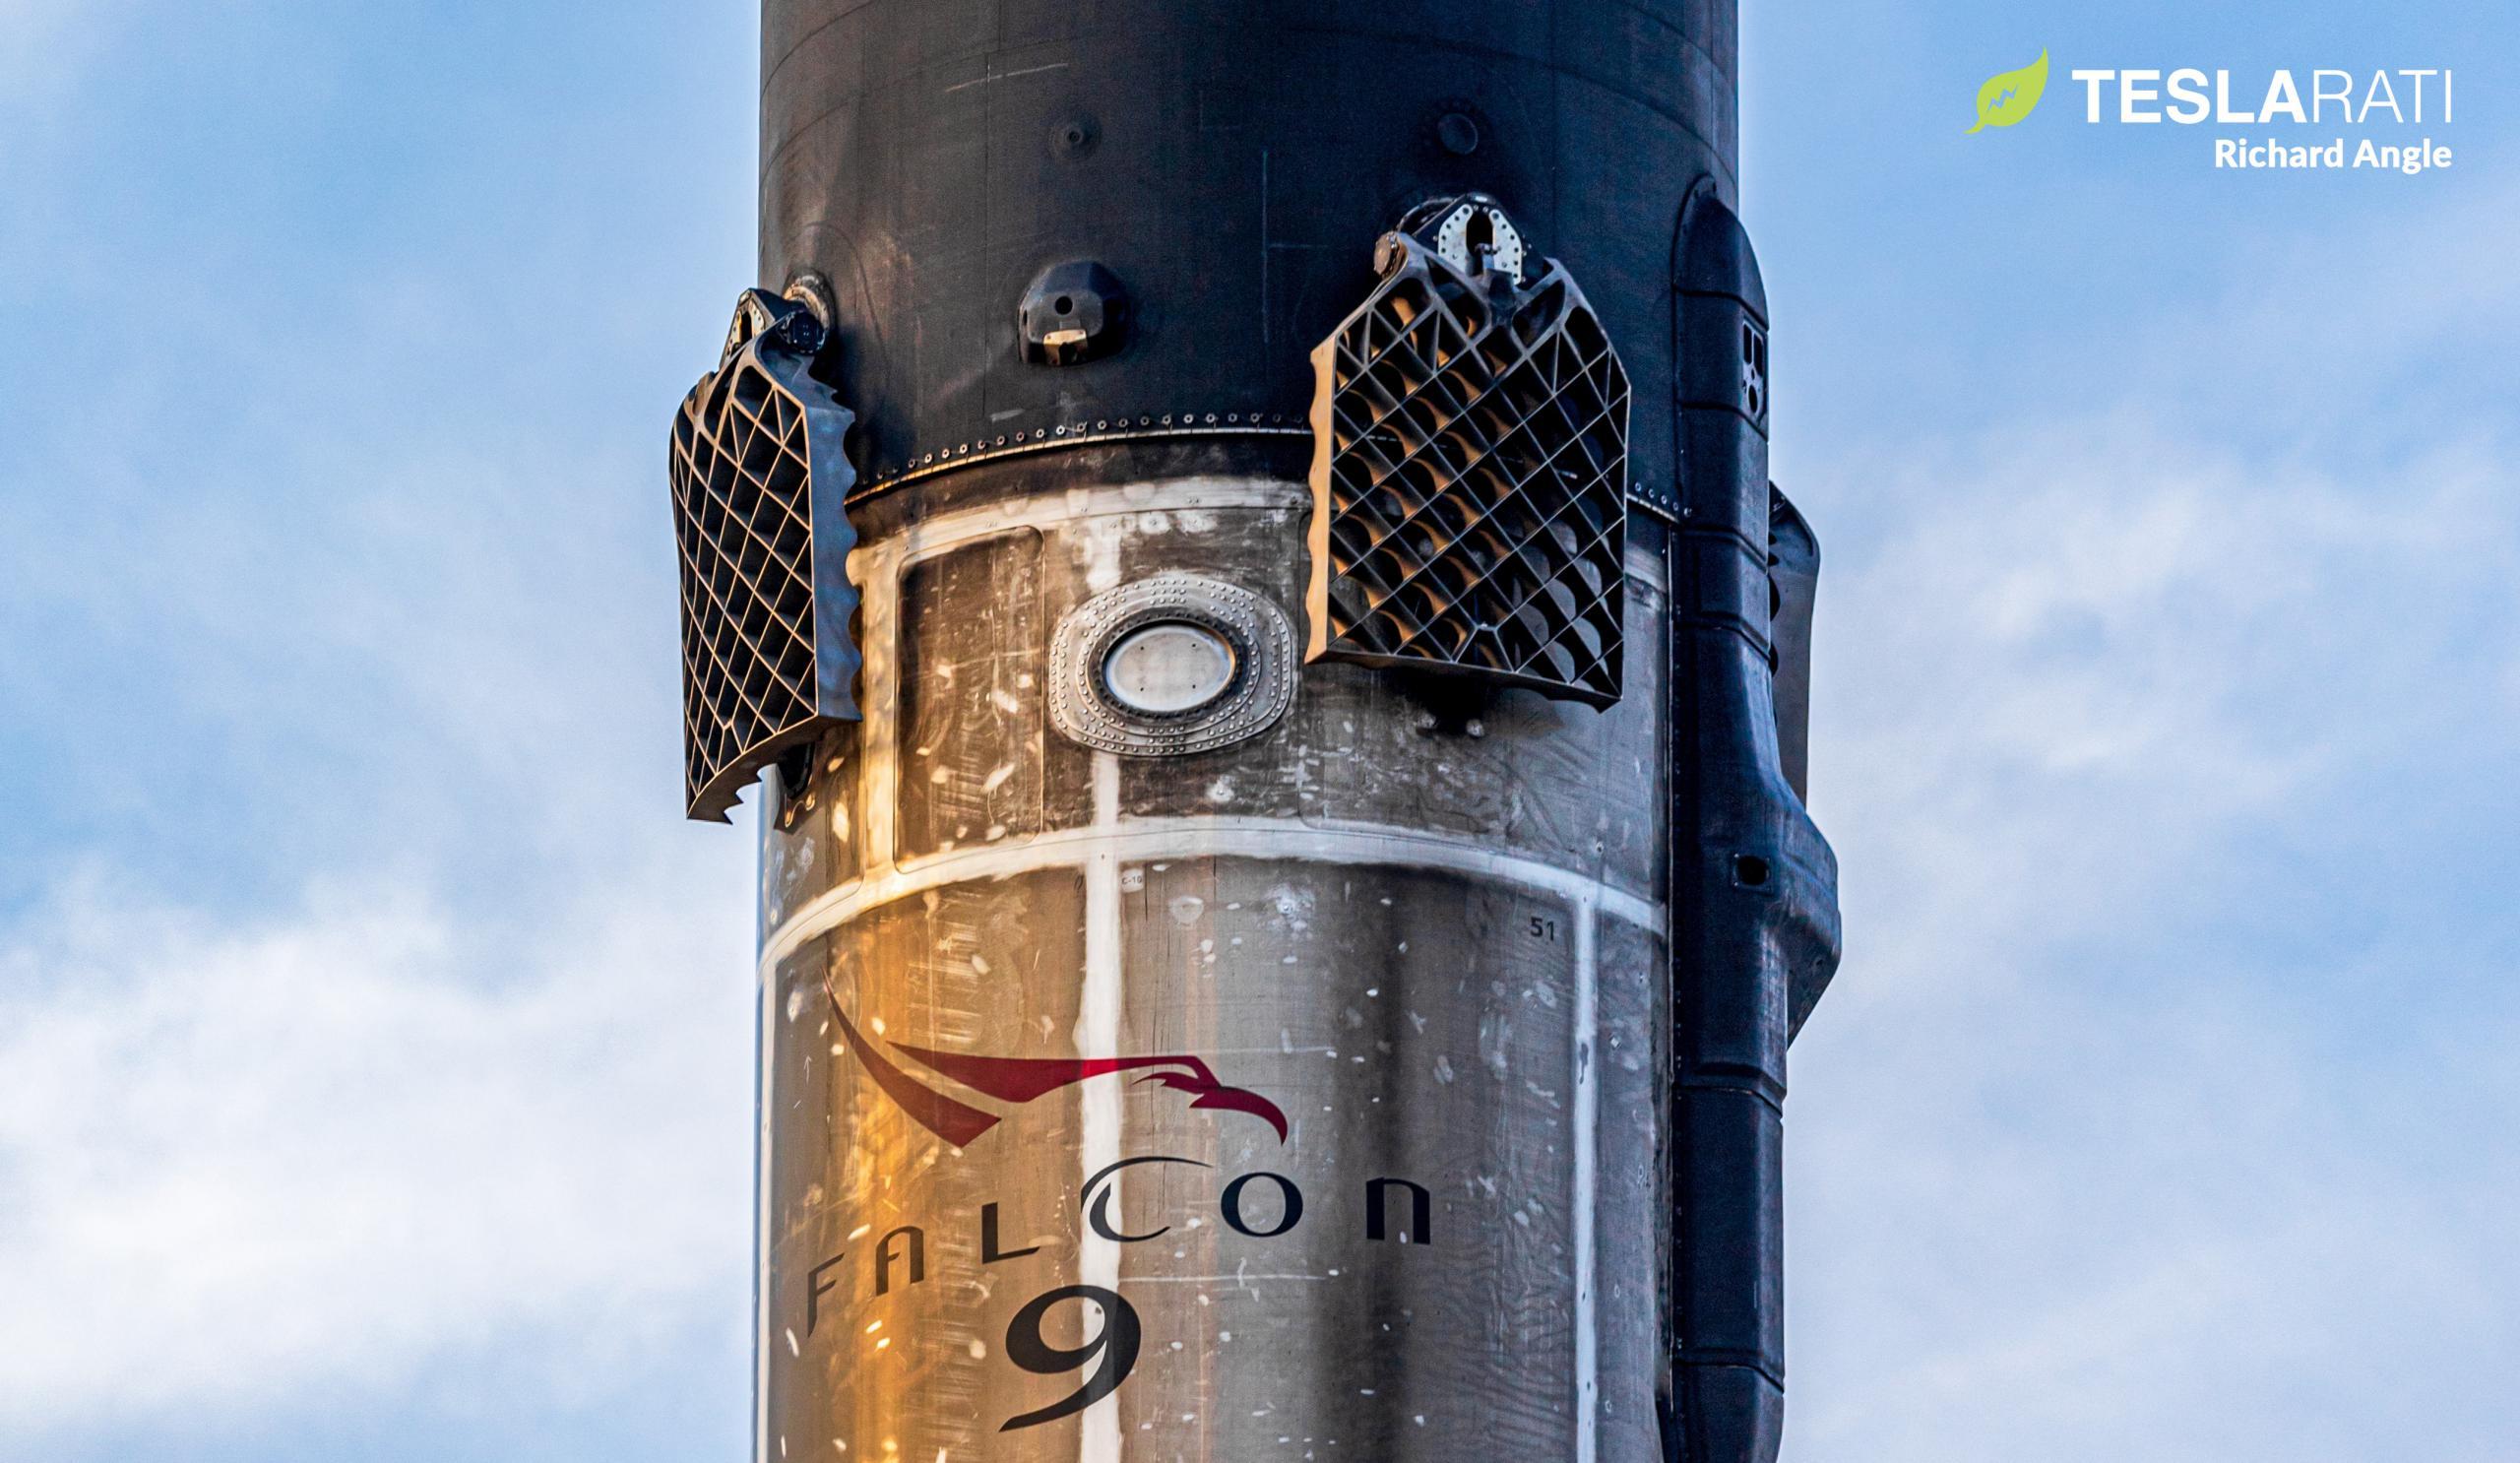 Starlink-21 Falcon 9 B1051 031621 (Richard Angle) port return 3 crop 2 (c)